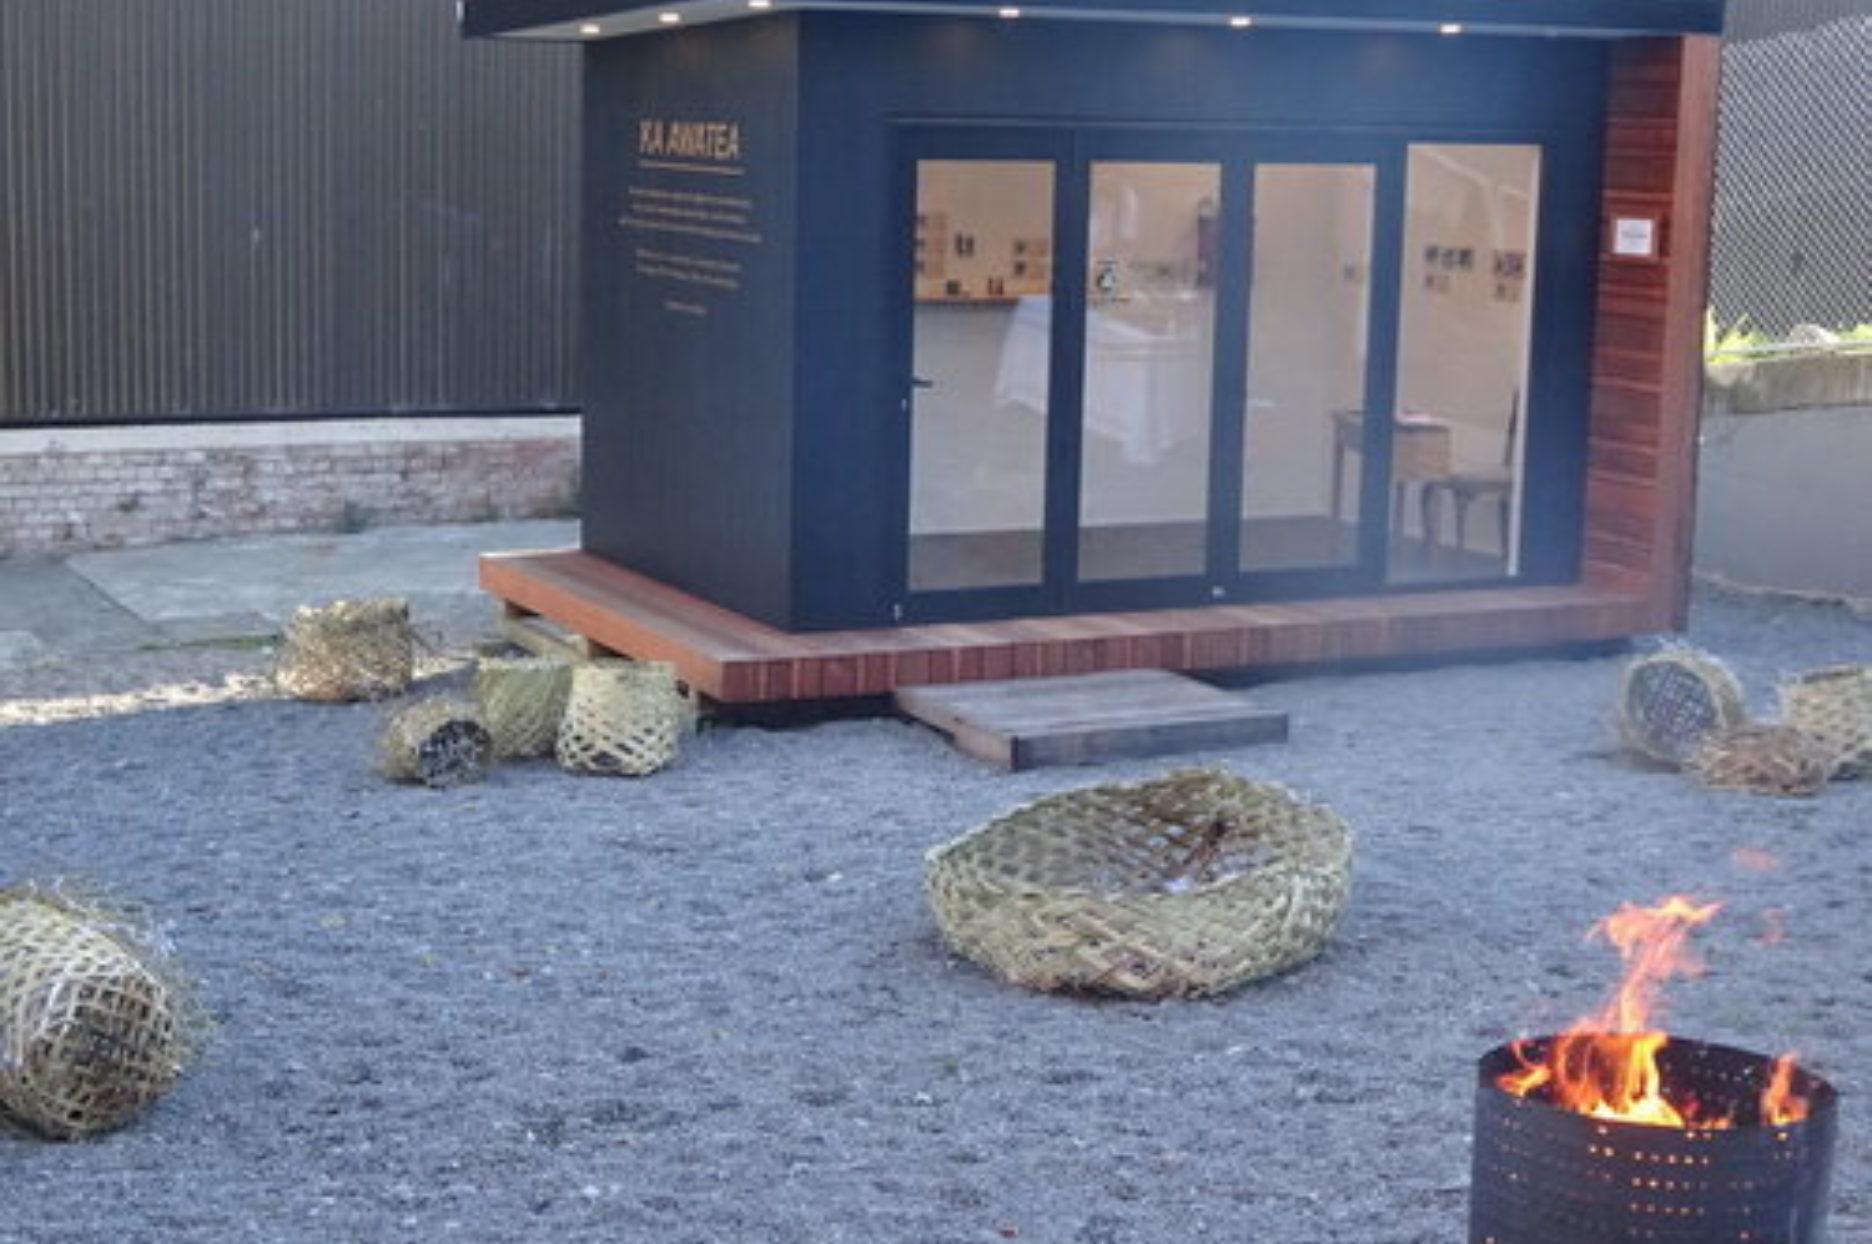 1 The Miniature Gallery with Waikawa kumara baskets by Paula Rigby and Leisa Aumua in foreground